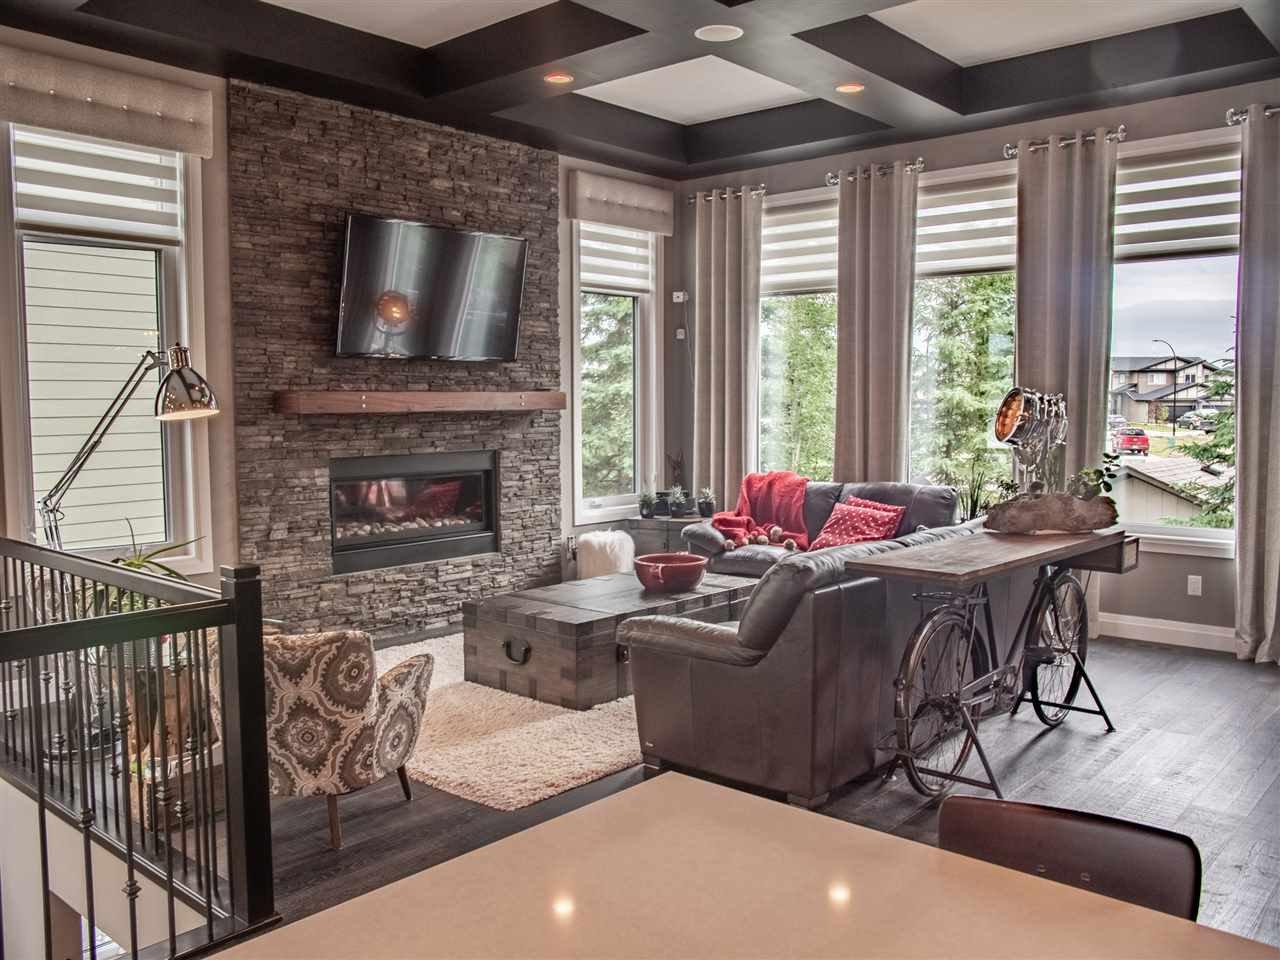 Photo 10: Photos: 58 Kenton Woods Lane NW: Spruce Grove House for sale : MLS®# E4166439